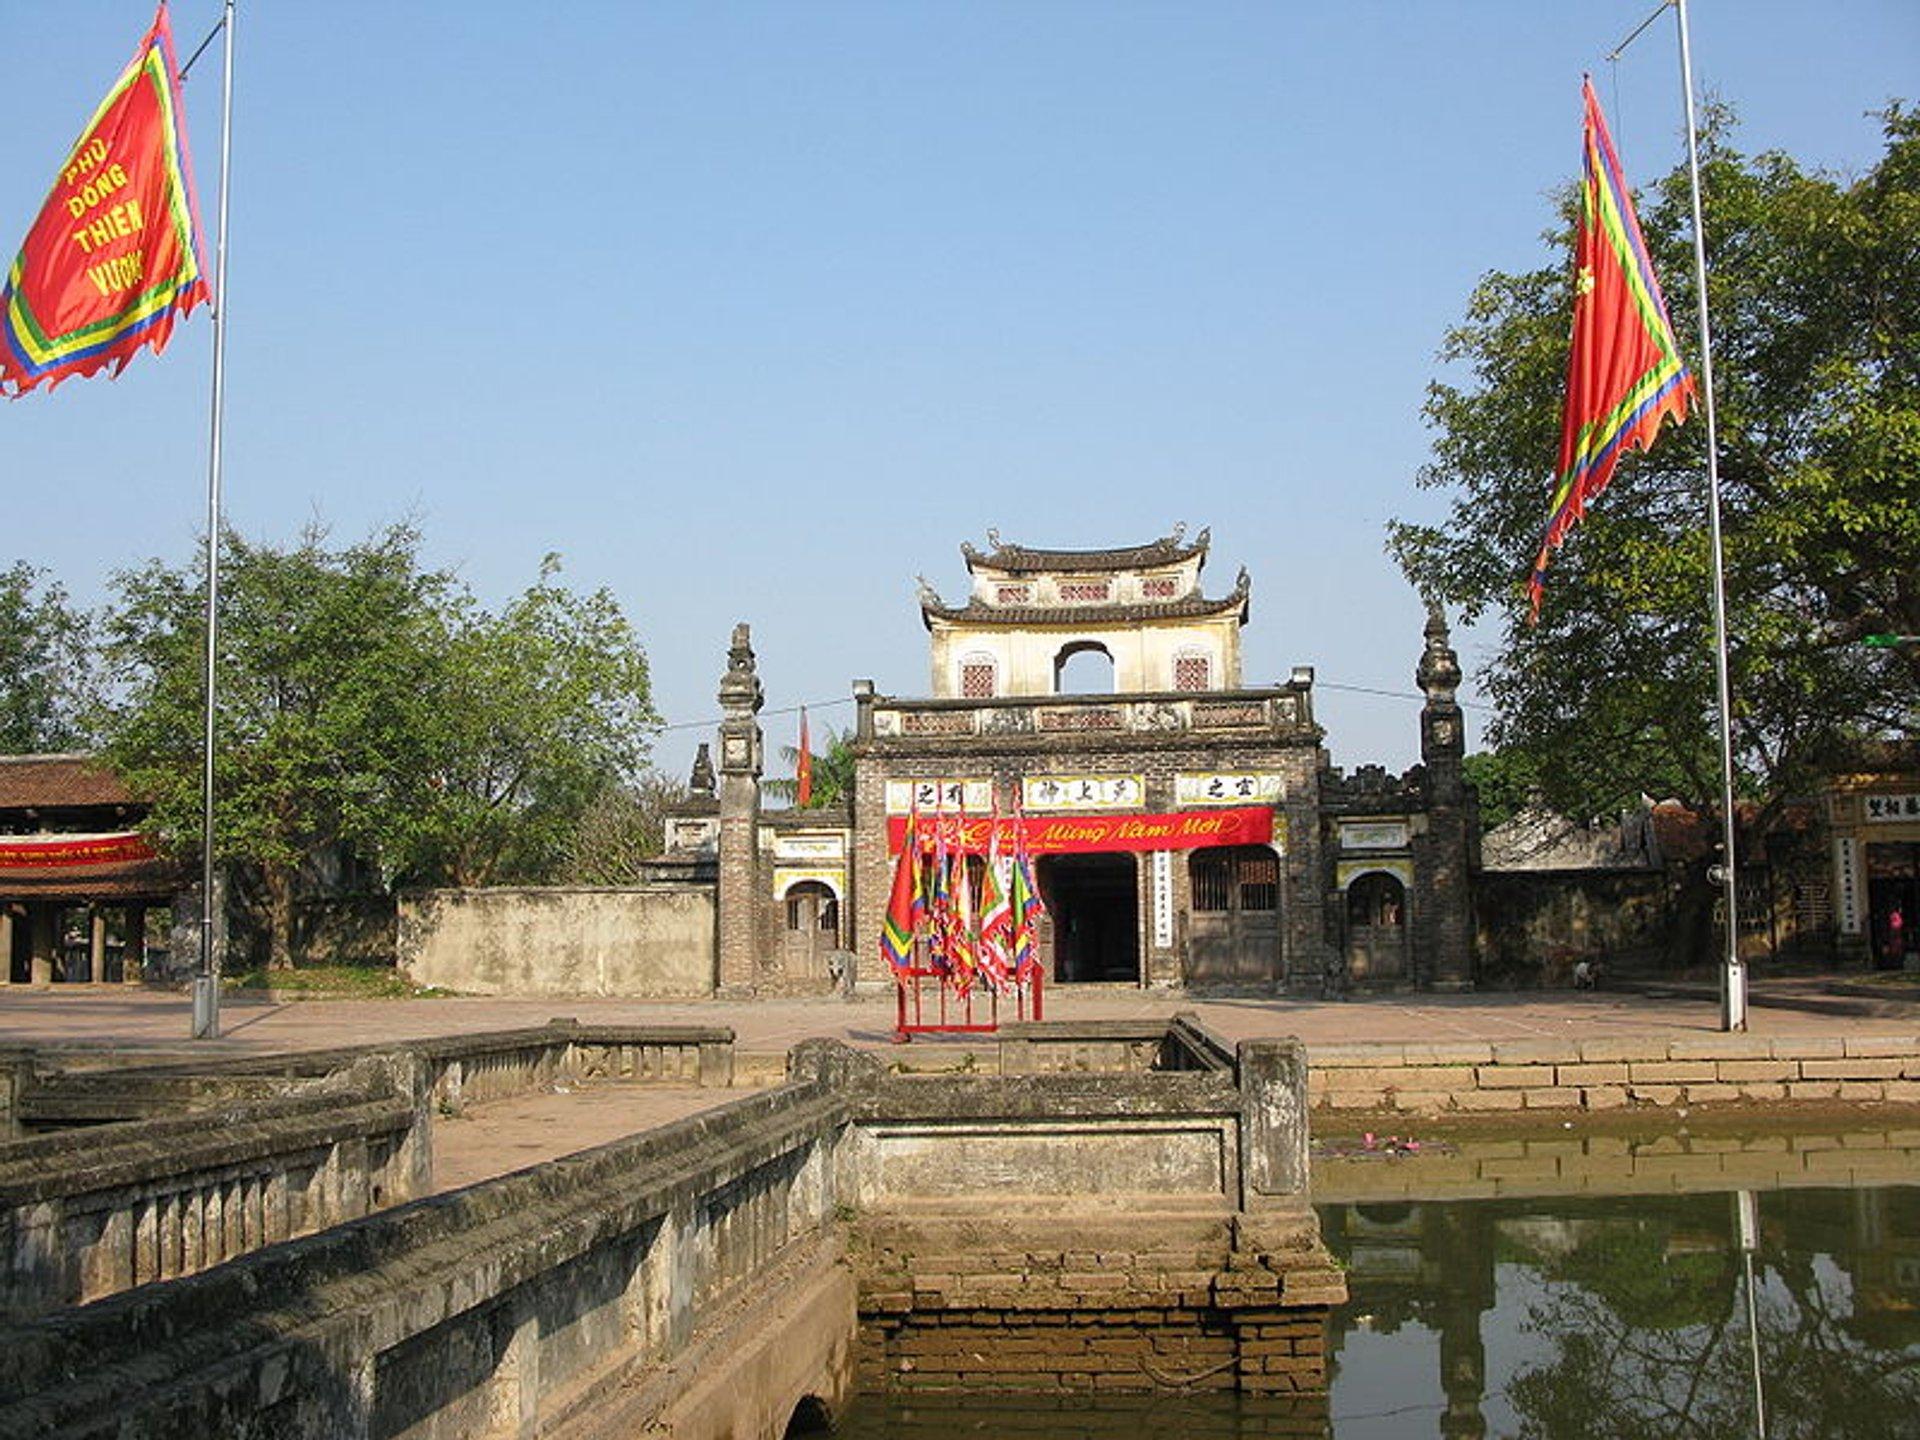 Best time for Giong Festival in Vietnam